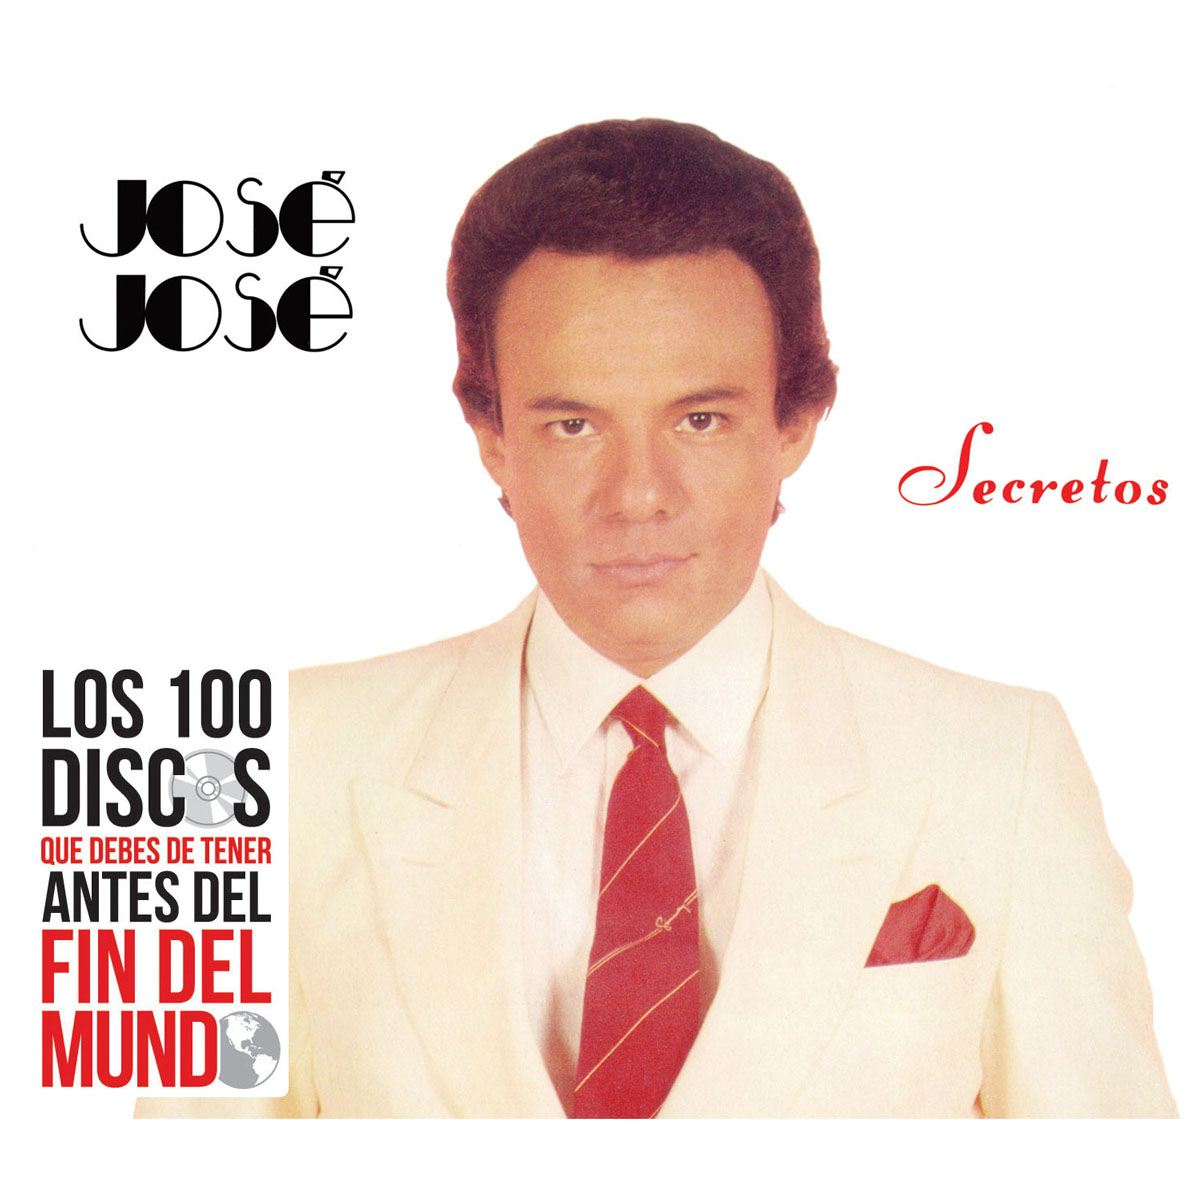 CD José José Secretos